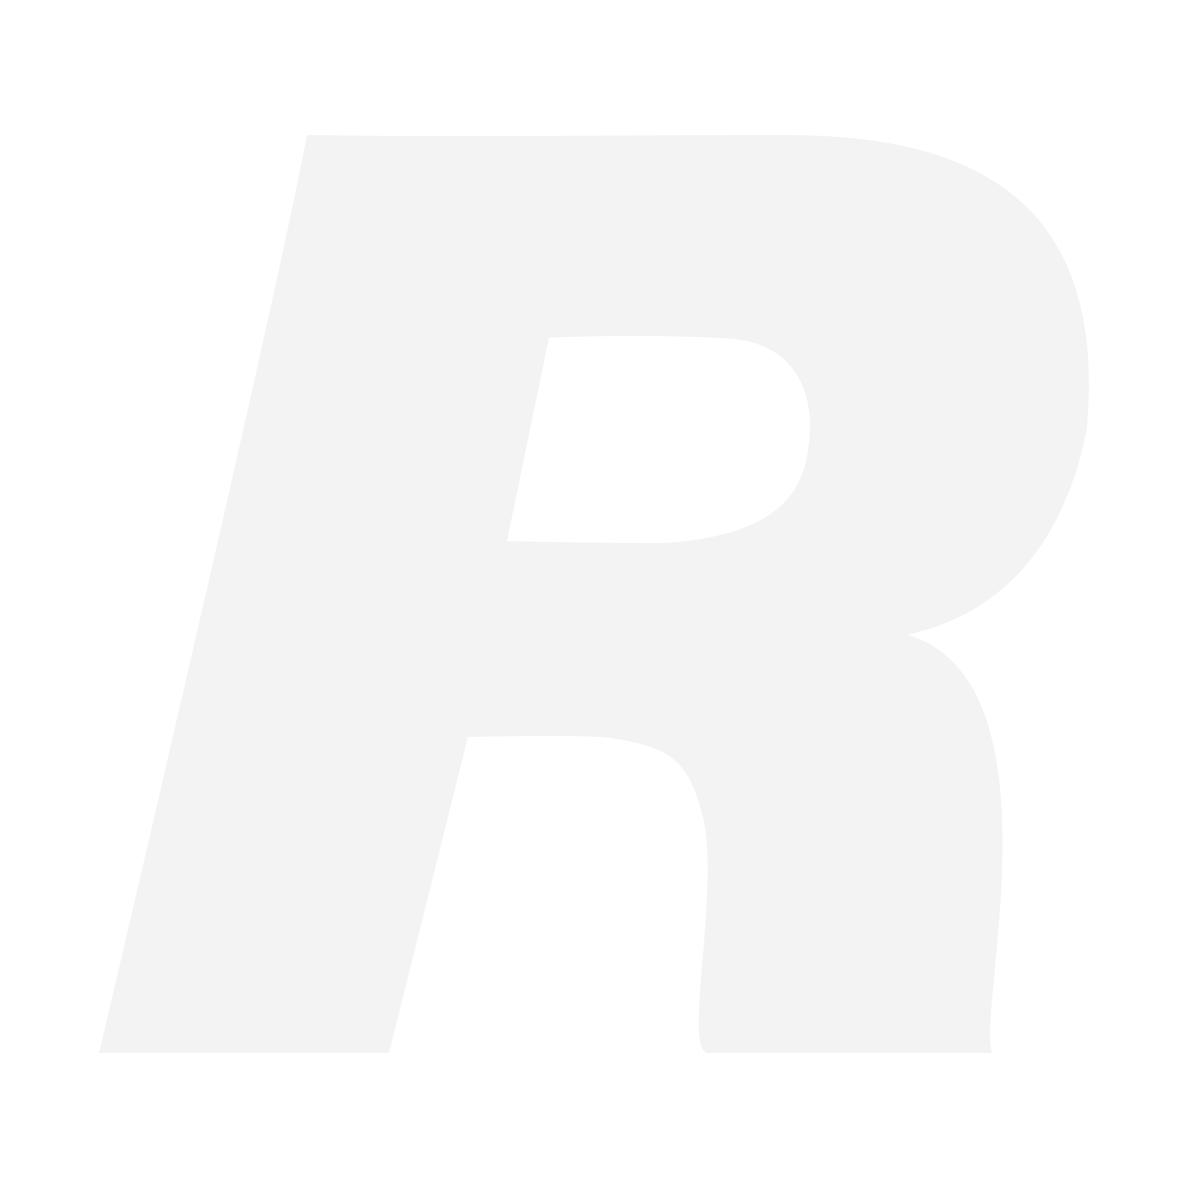 GoPro Hero 5 Black + Ski Bundle